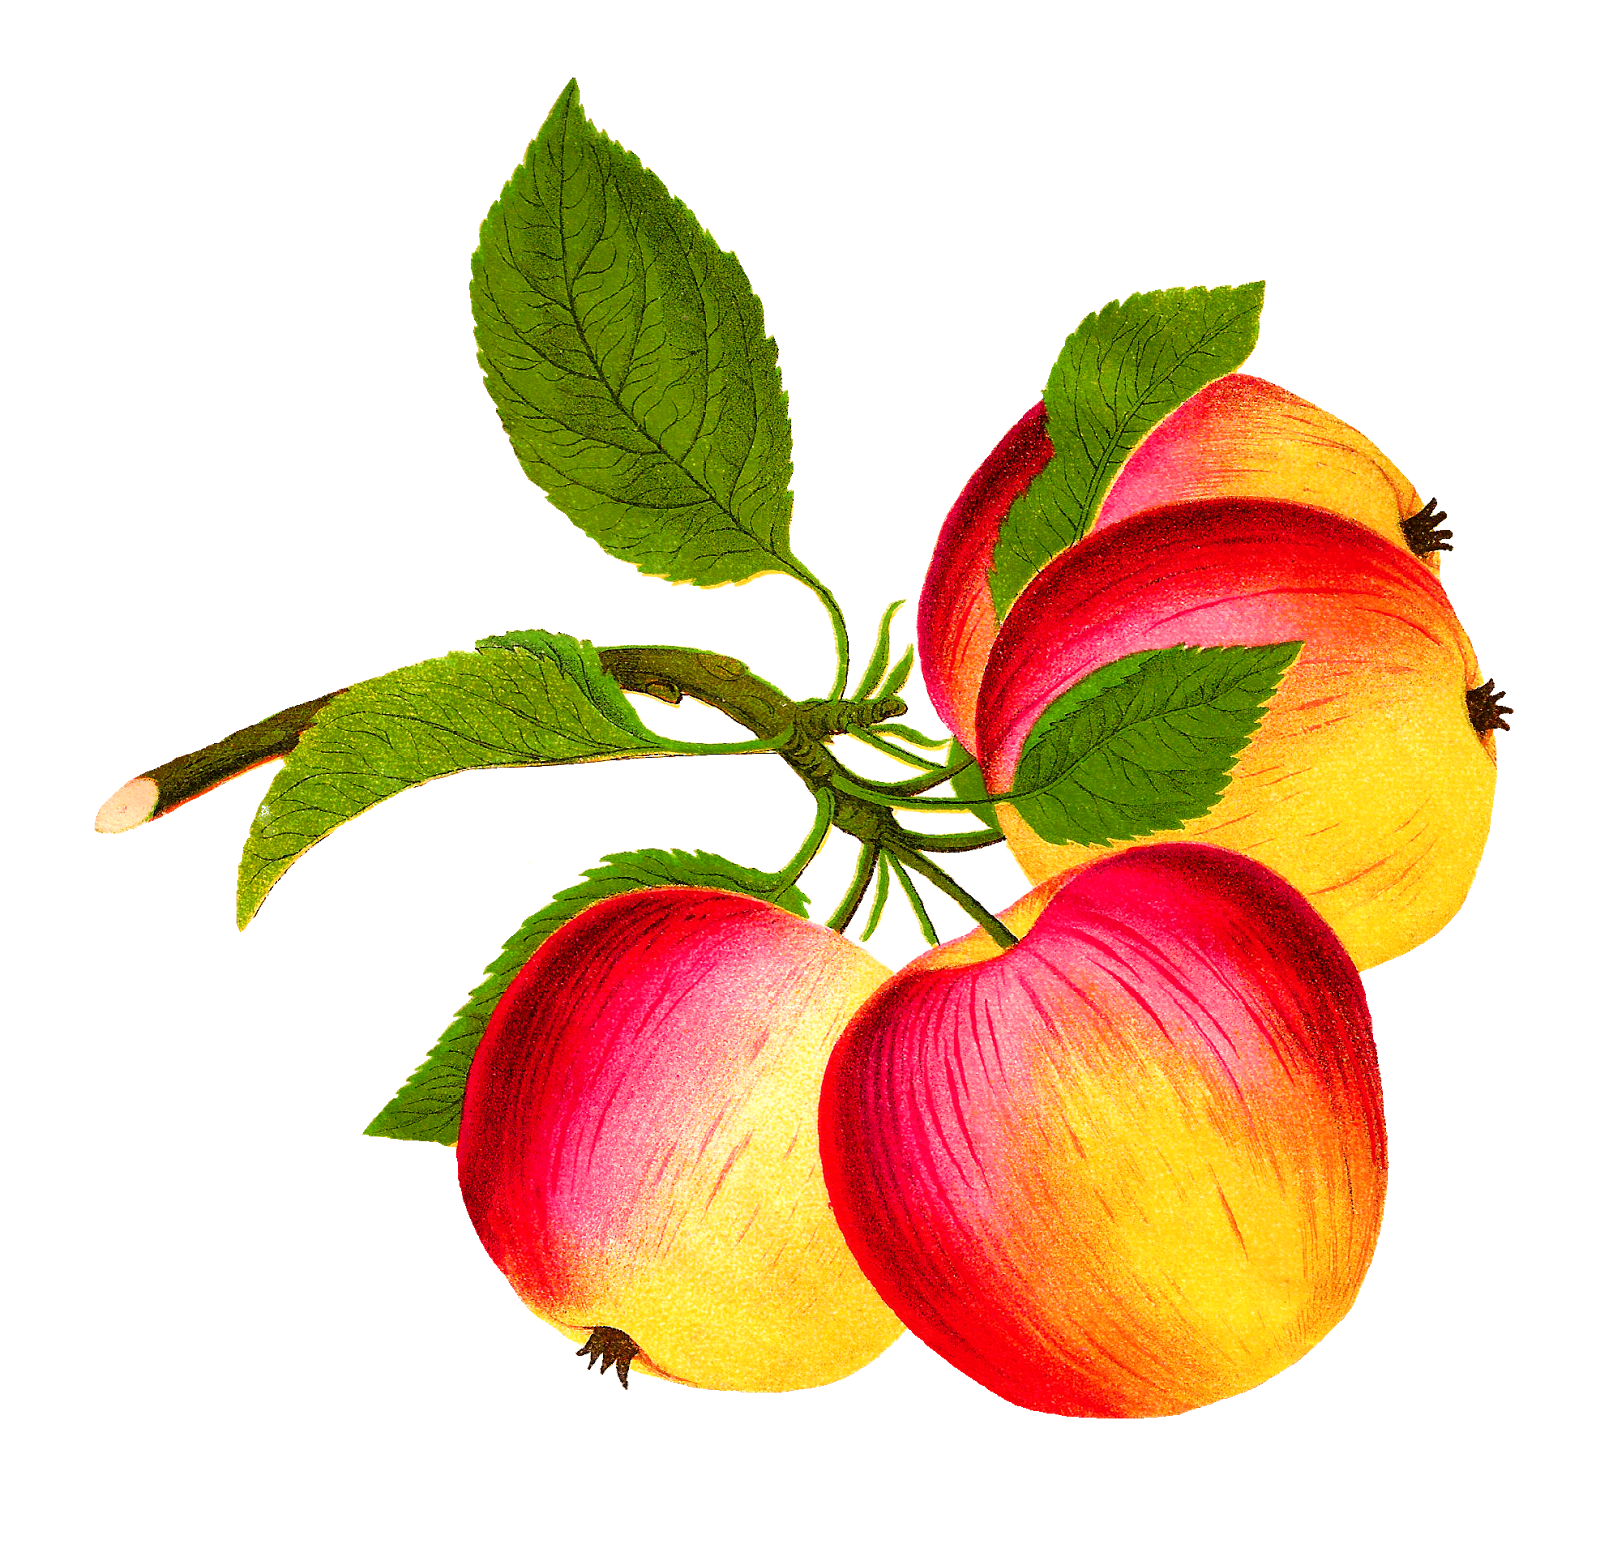 Fruits clipart victorian. Digital fruit download christmas